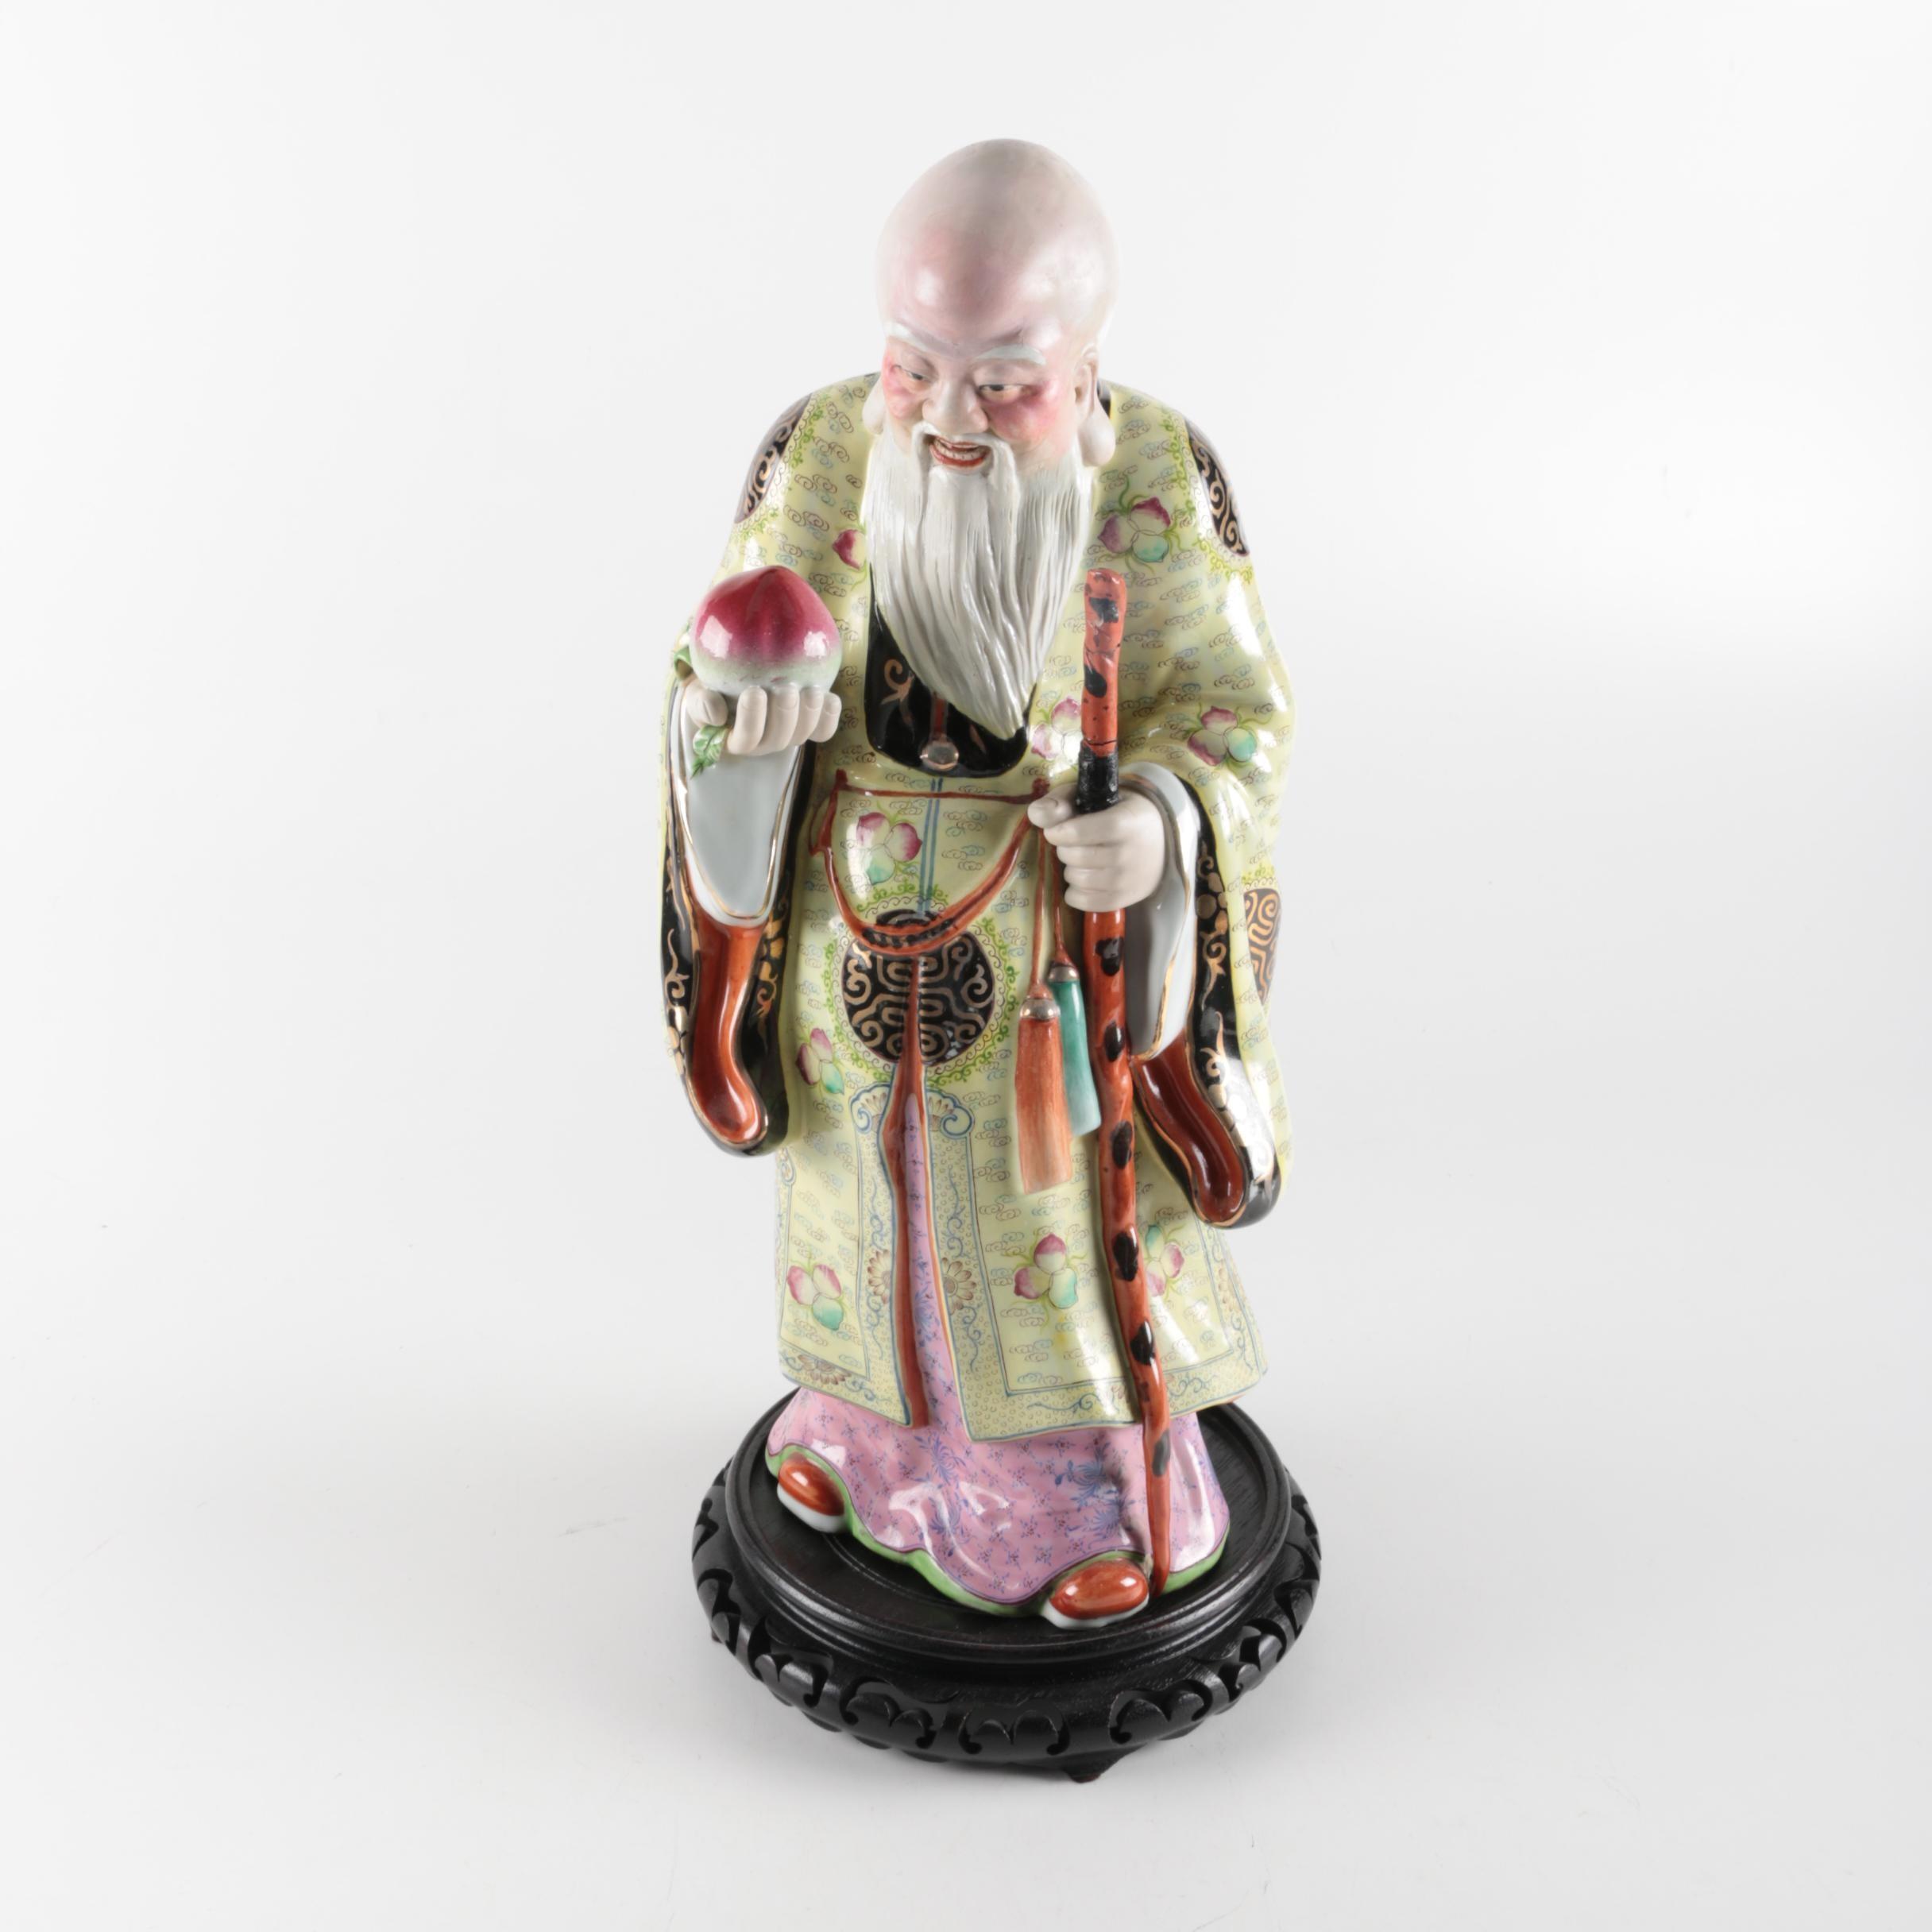 Vintage Chinese Ceramic Figurine Immortal Shou Lao Xing